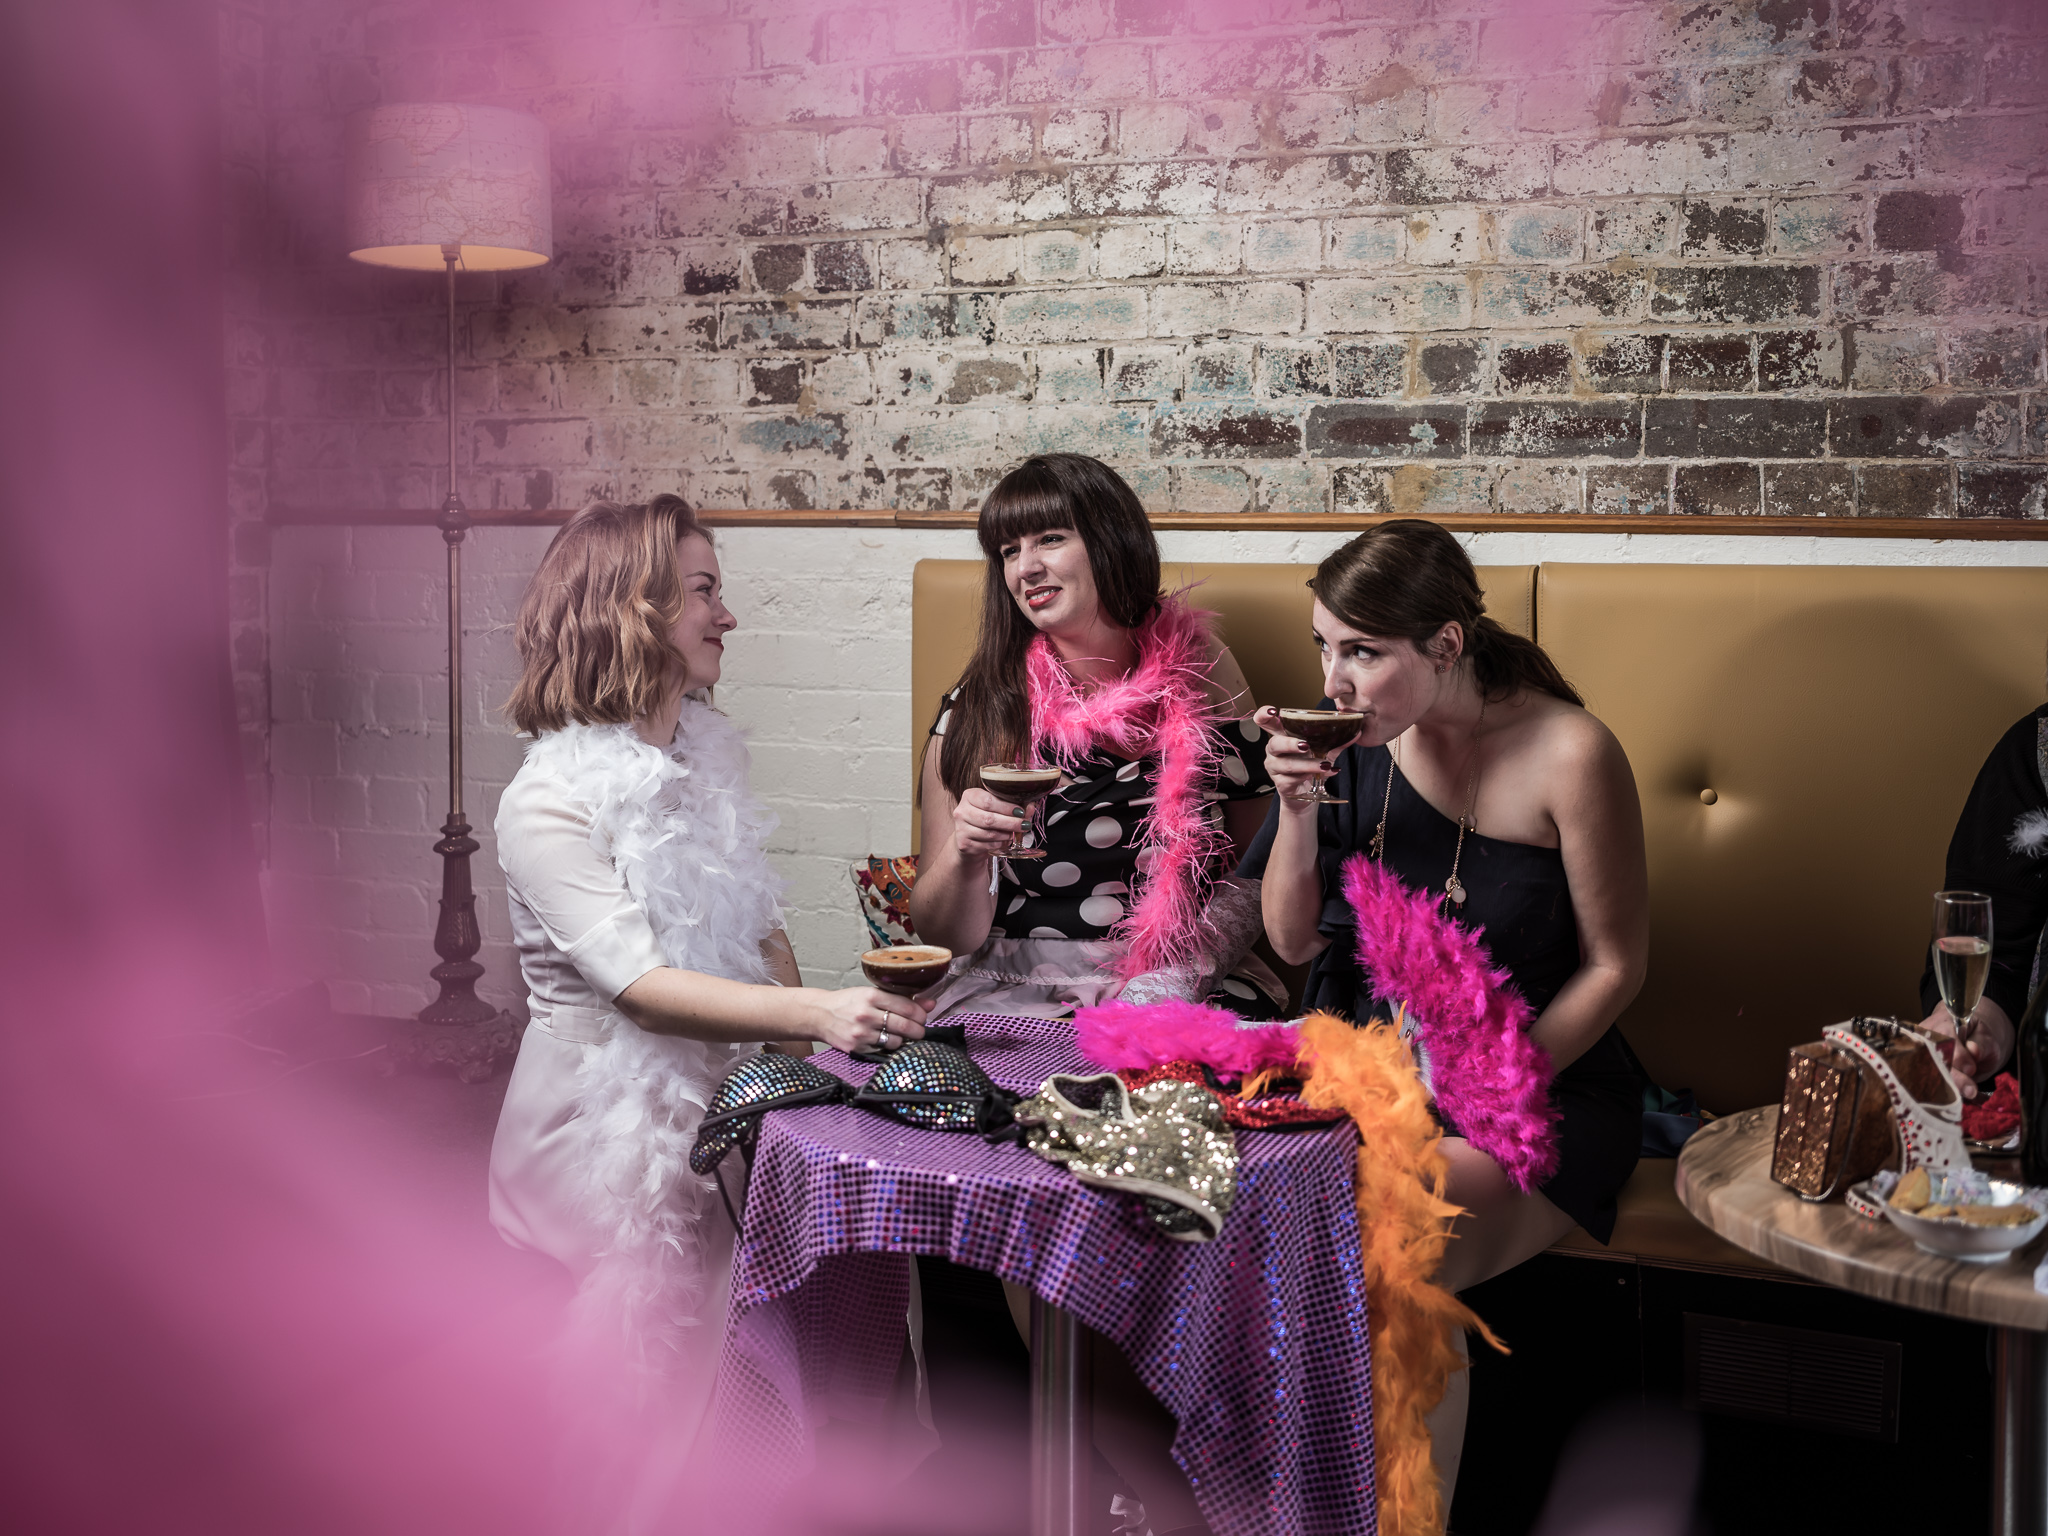 Showgirl - A taste of burlesque!